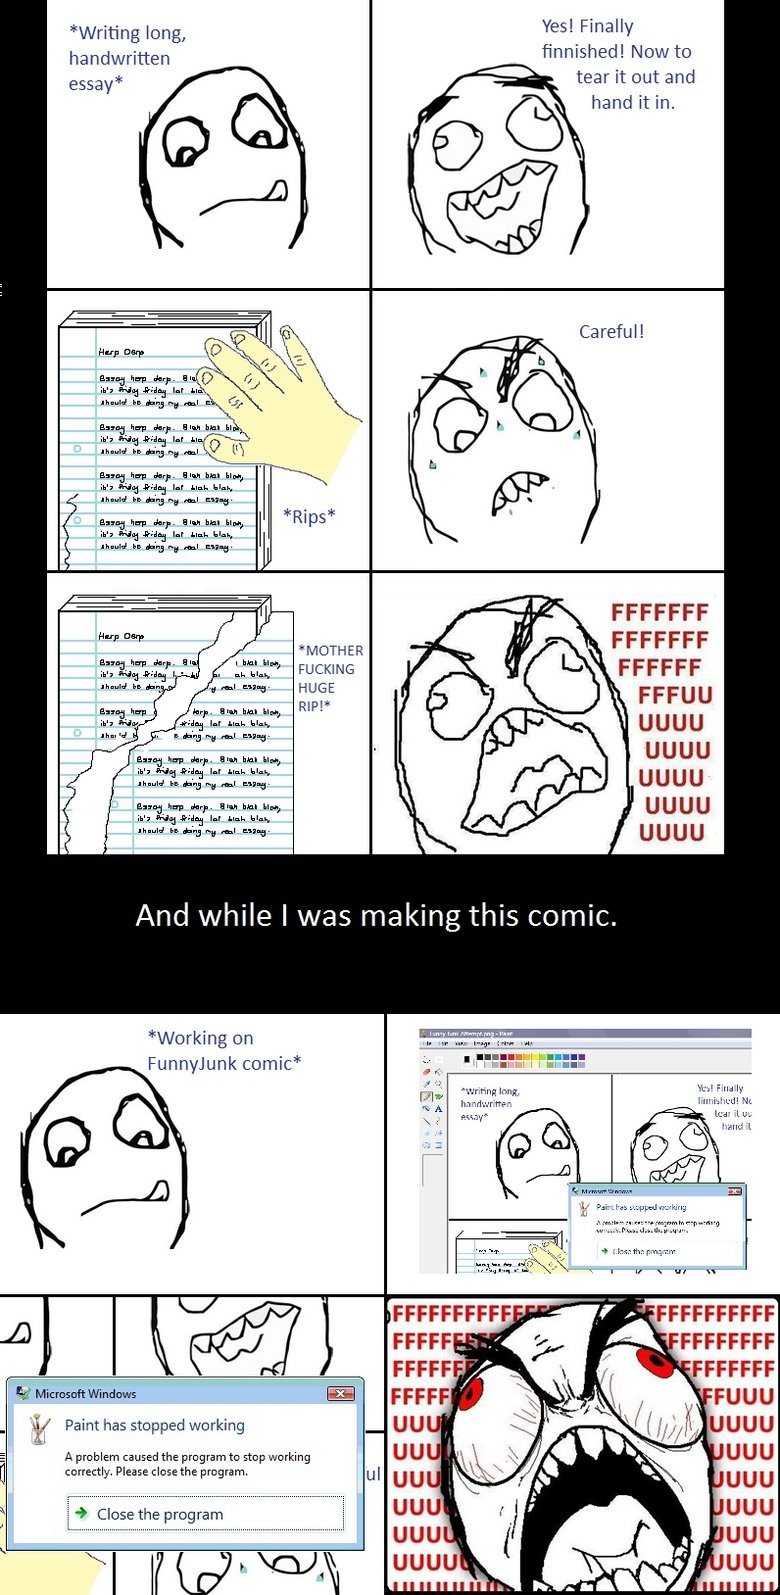 011 Essay Example Funny Pictures Auto Amazing Joke Writer Joker In Hindi Jokes English Full